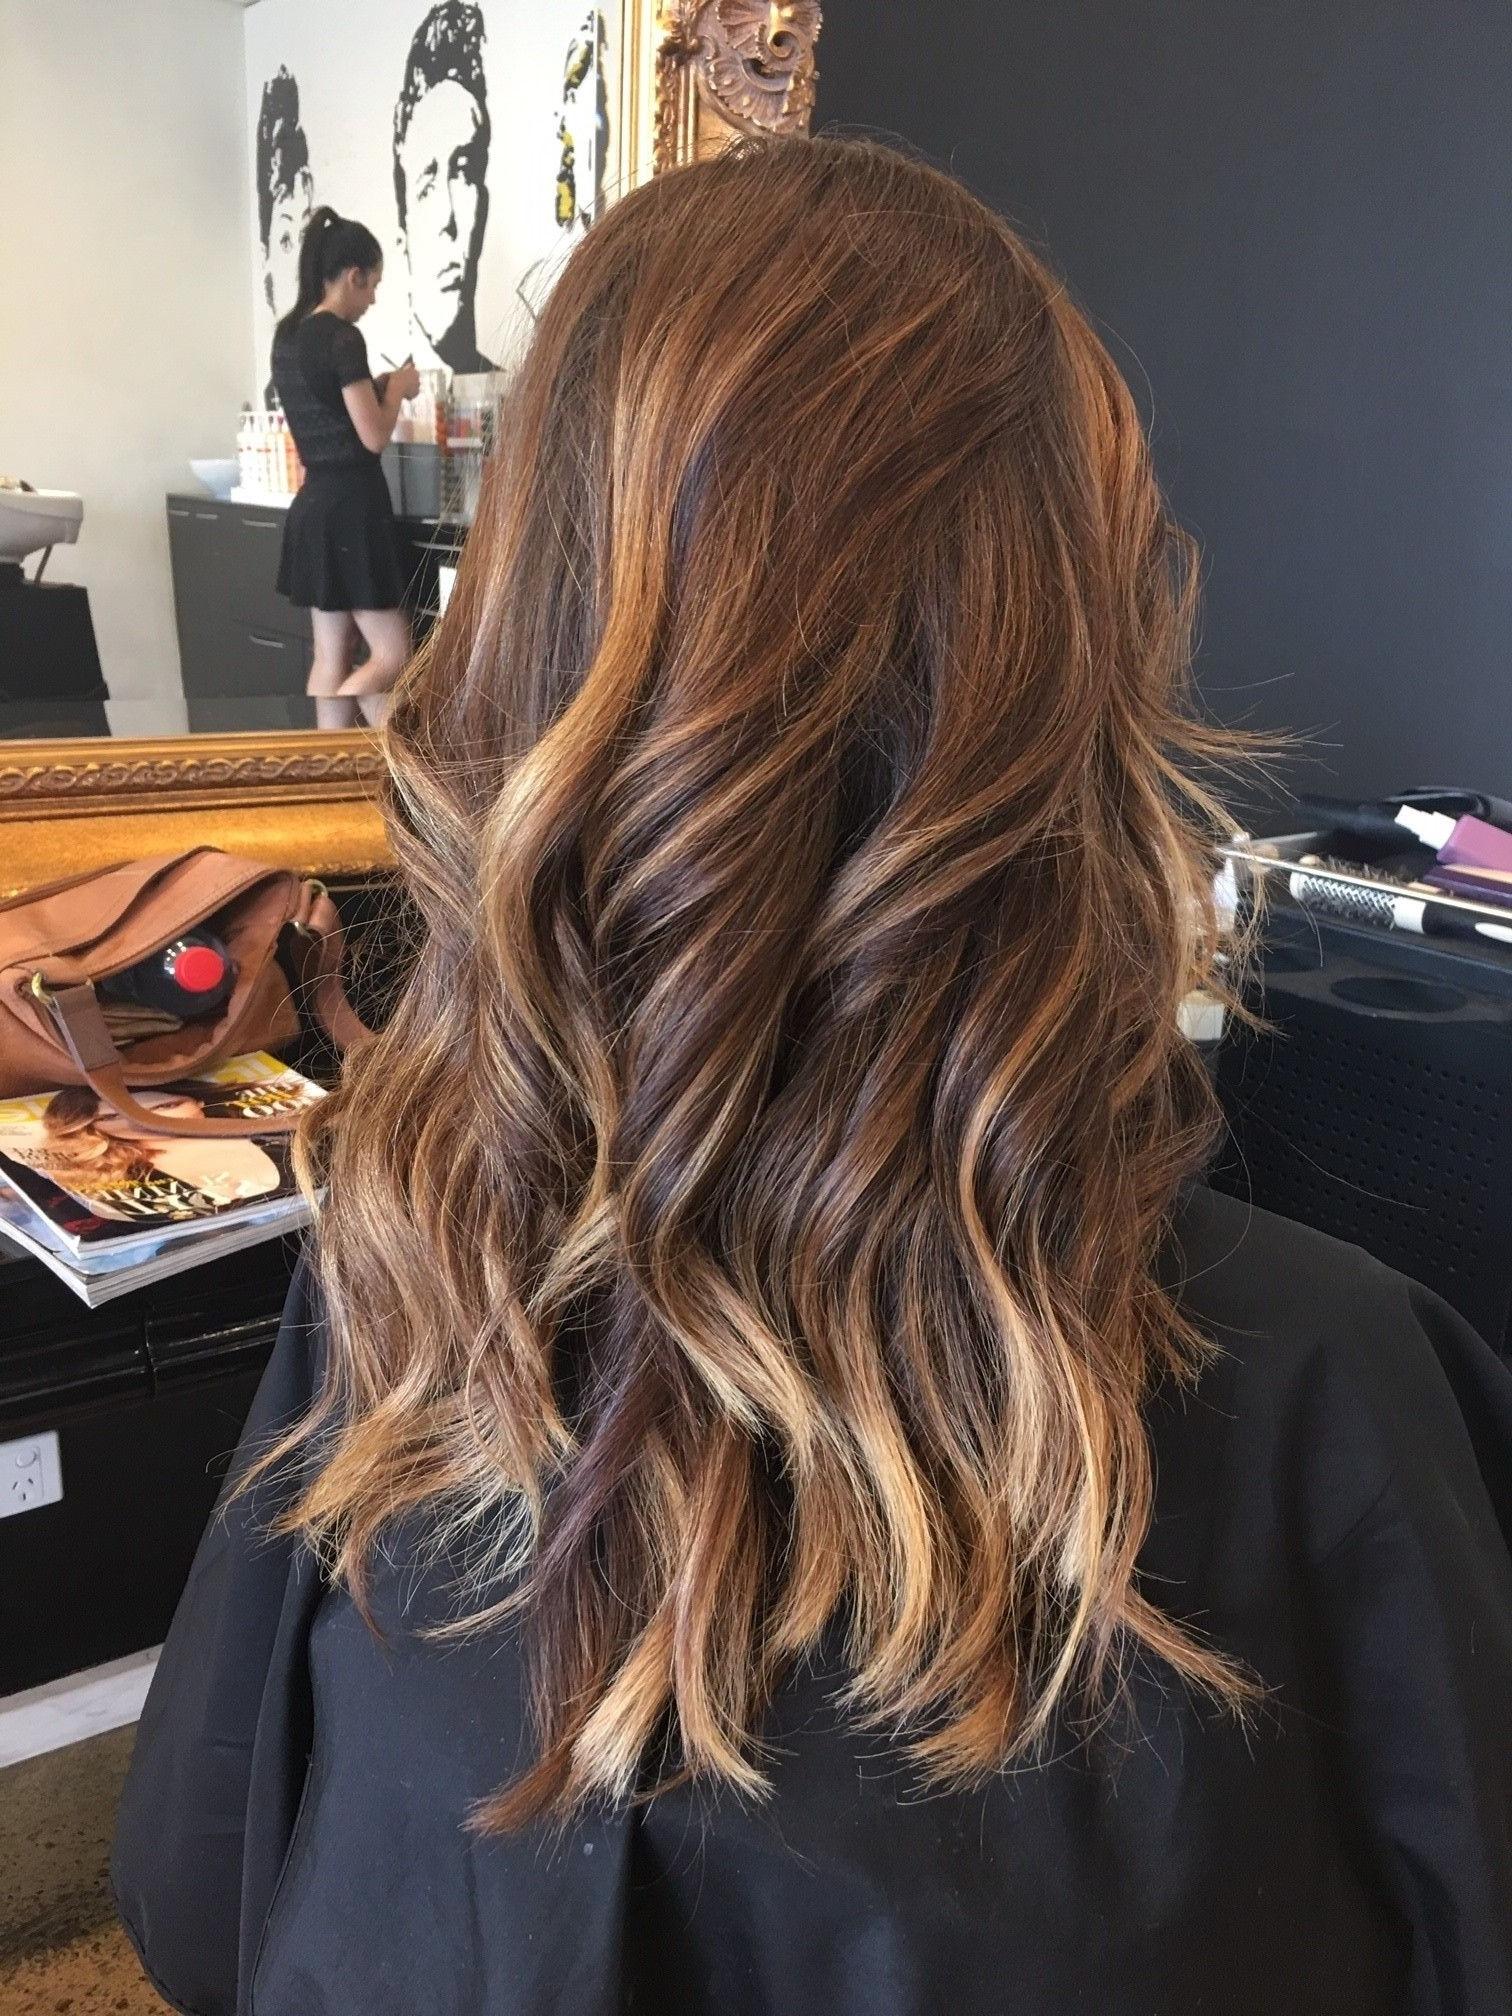 Current Tortoiseshell Straight Blonde Hairstyles Pertaining To Kinky #curly #straight #hair #uros #mikic #tortoiseshell #adelaide (View 3 of 20)